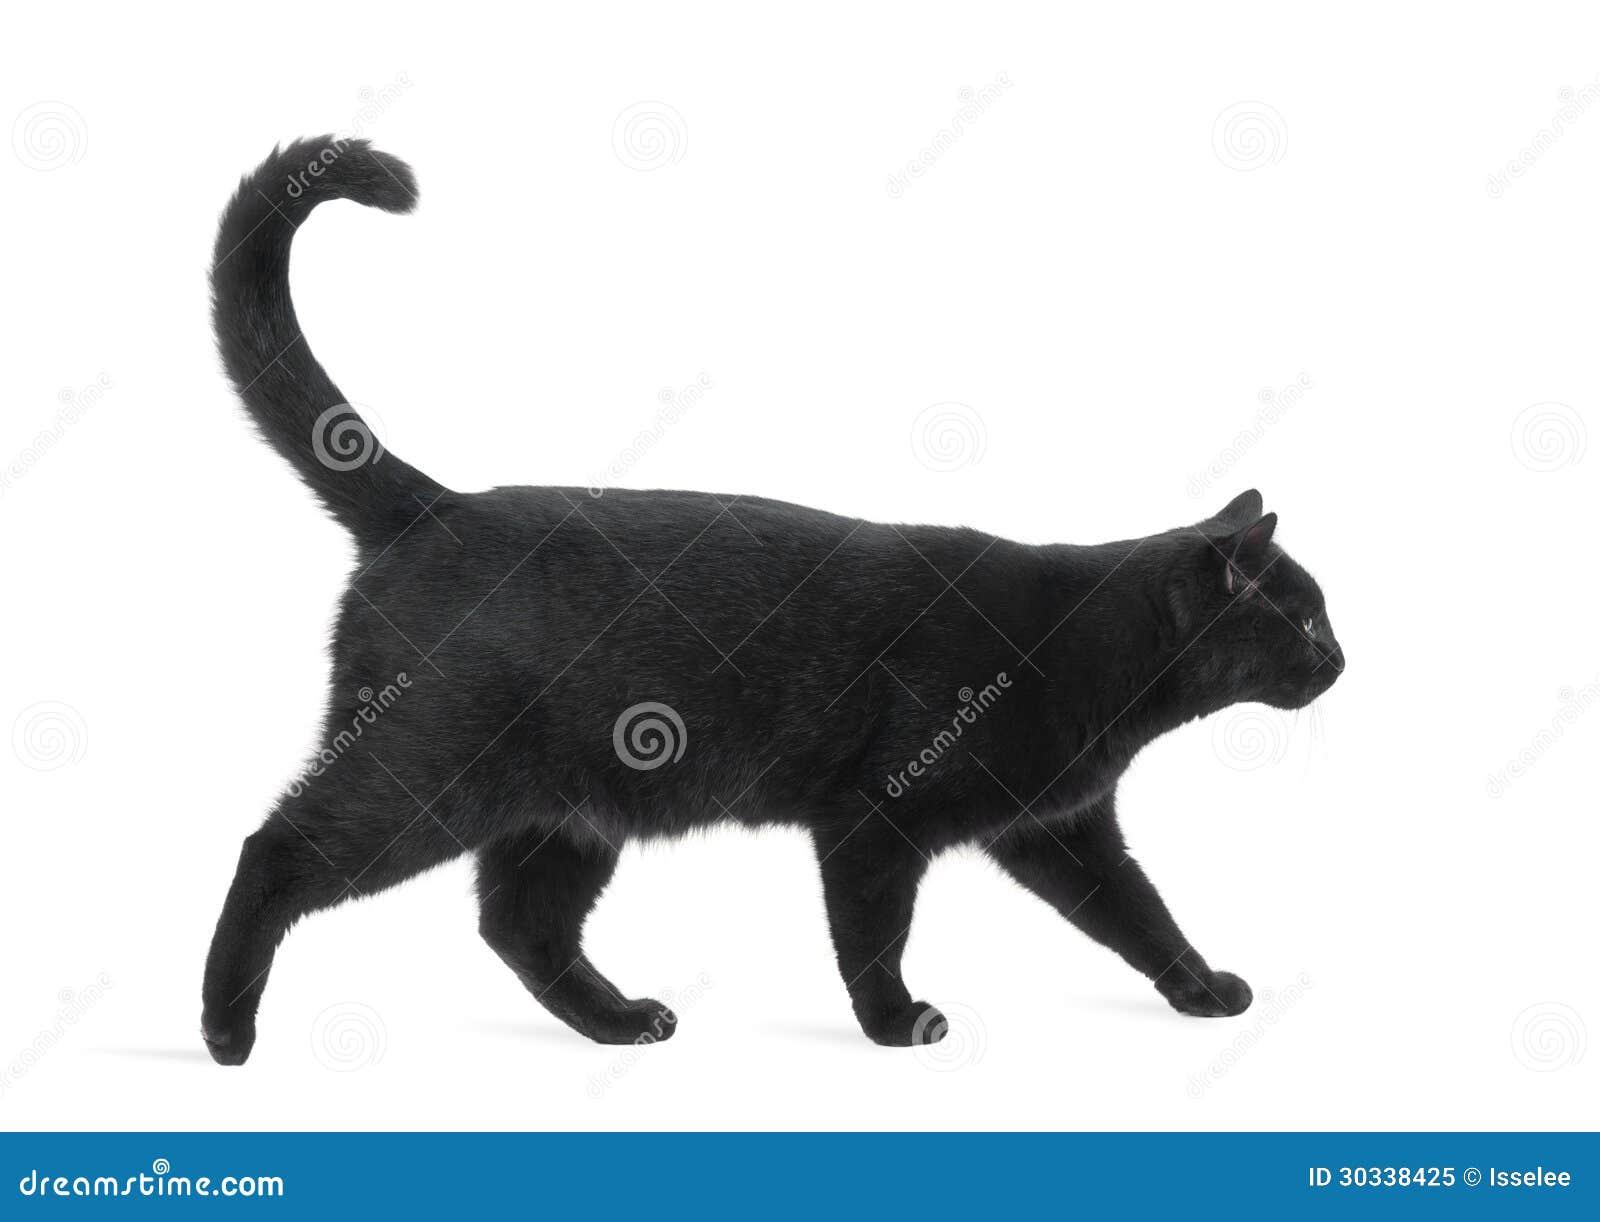 lucky cat adoptions